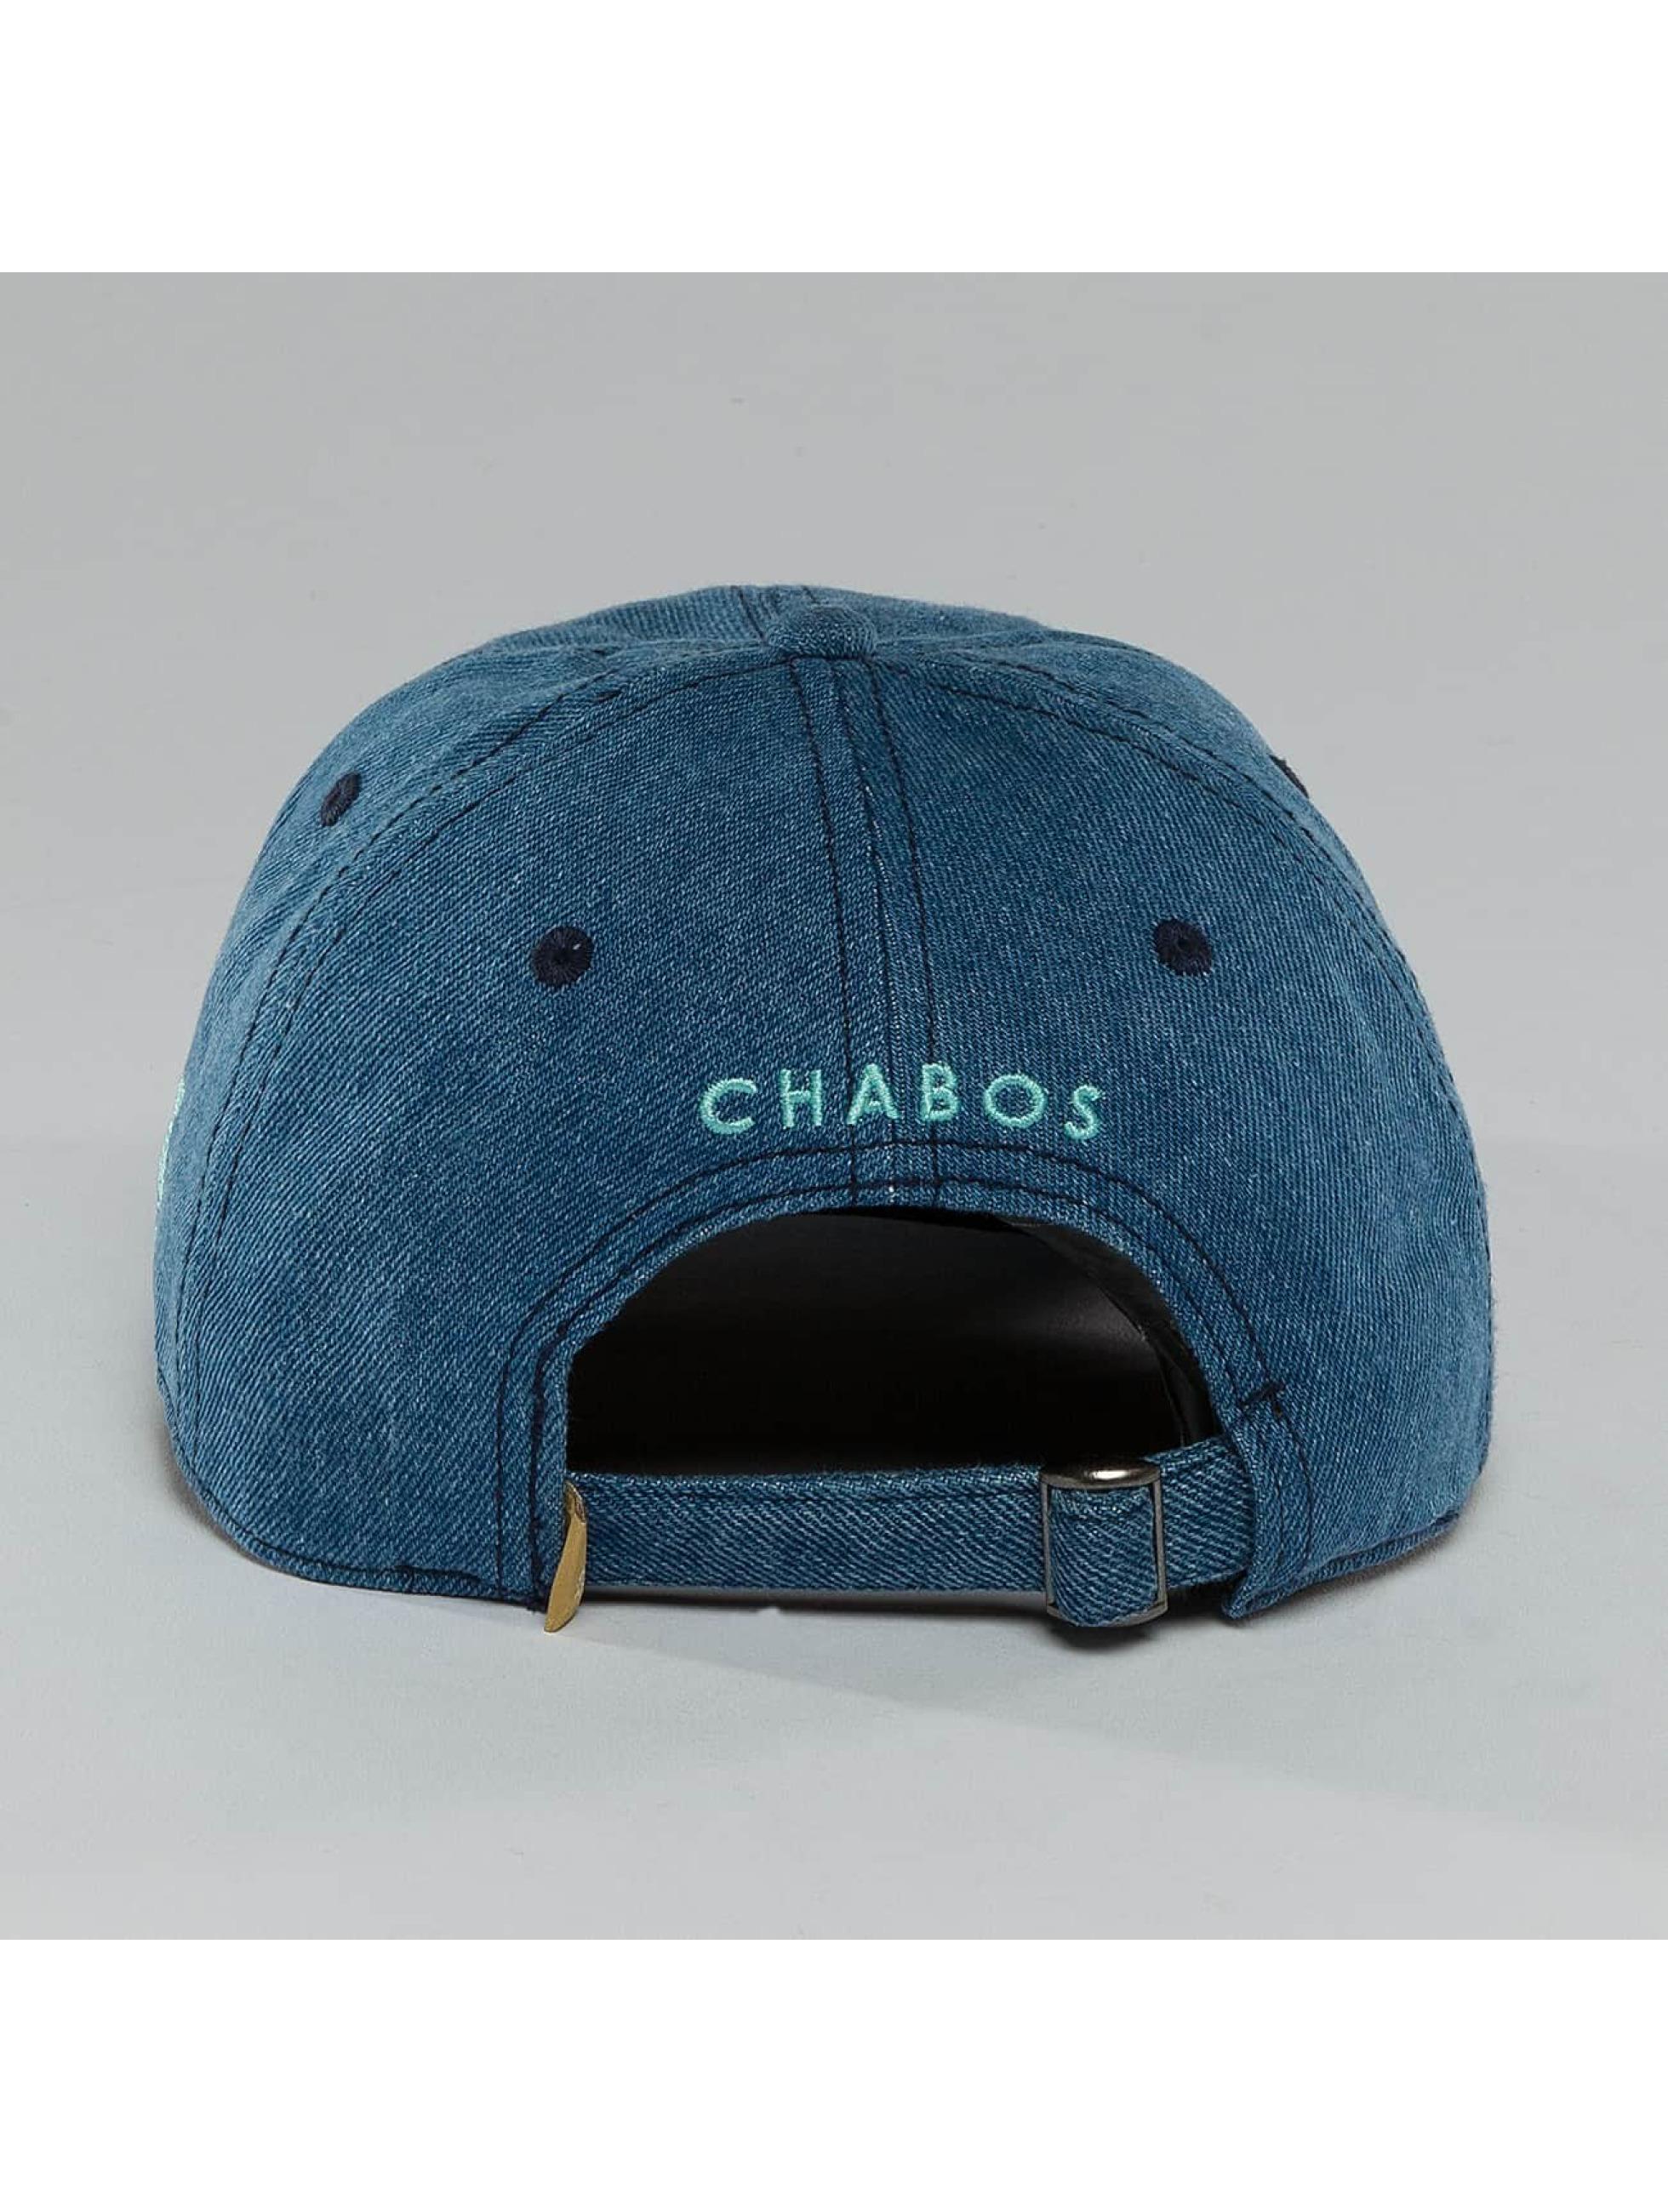 CHABOS IIVII Snapback Cap Pyramid blue